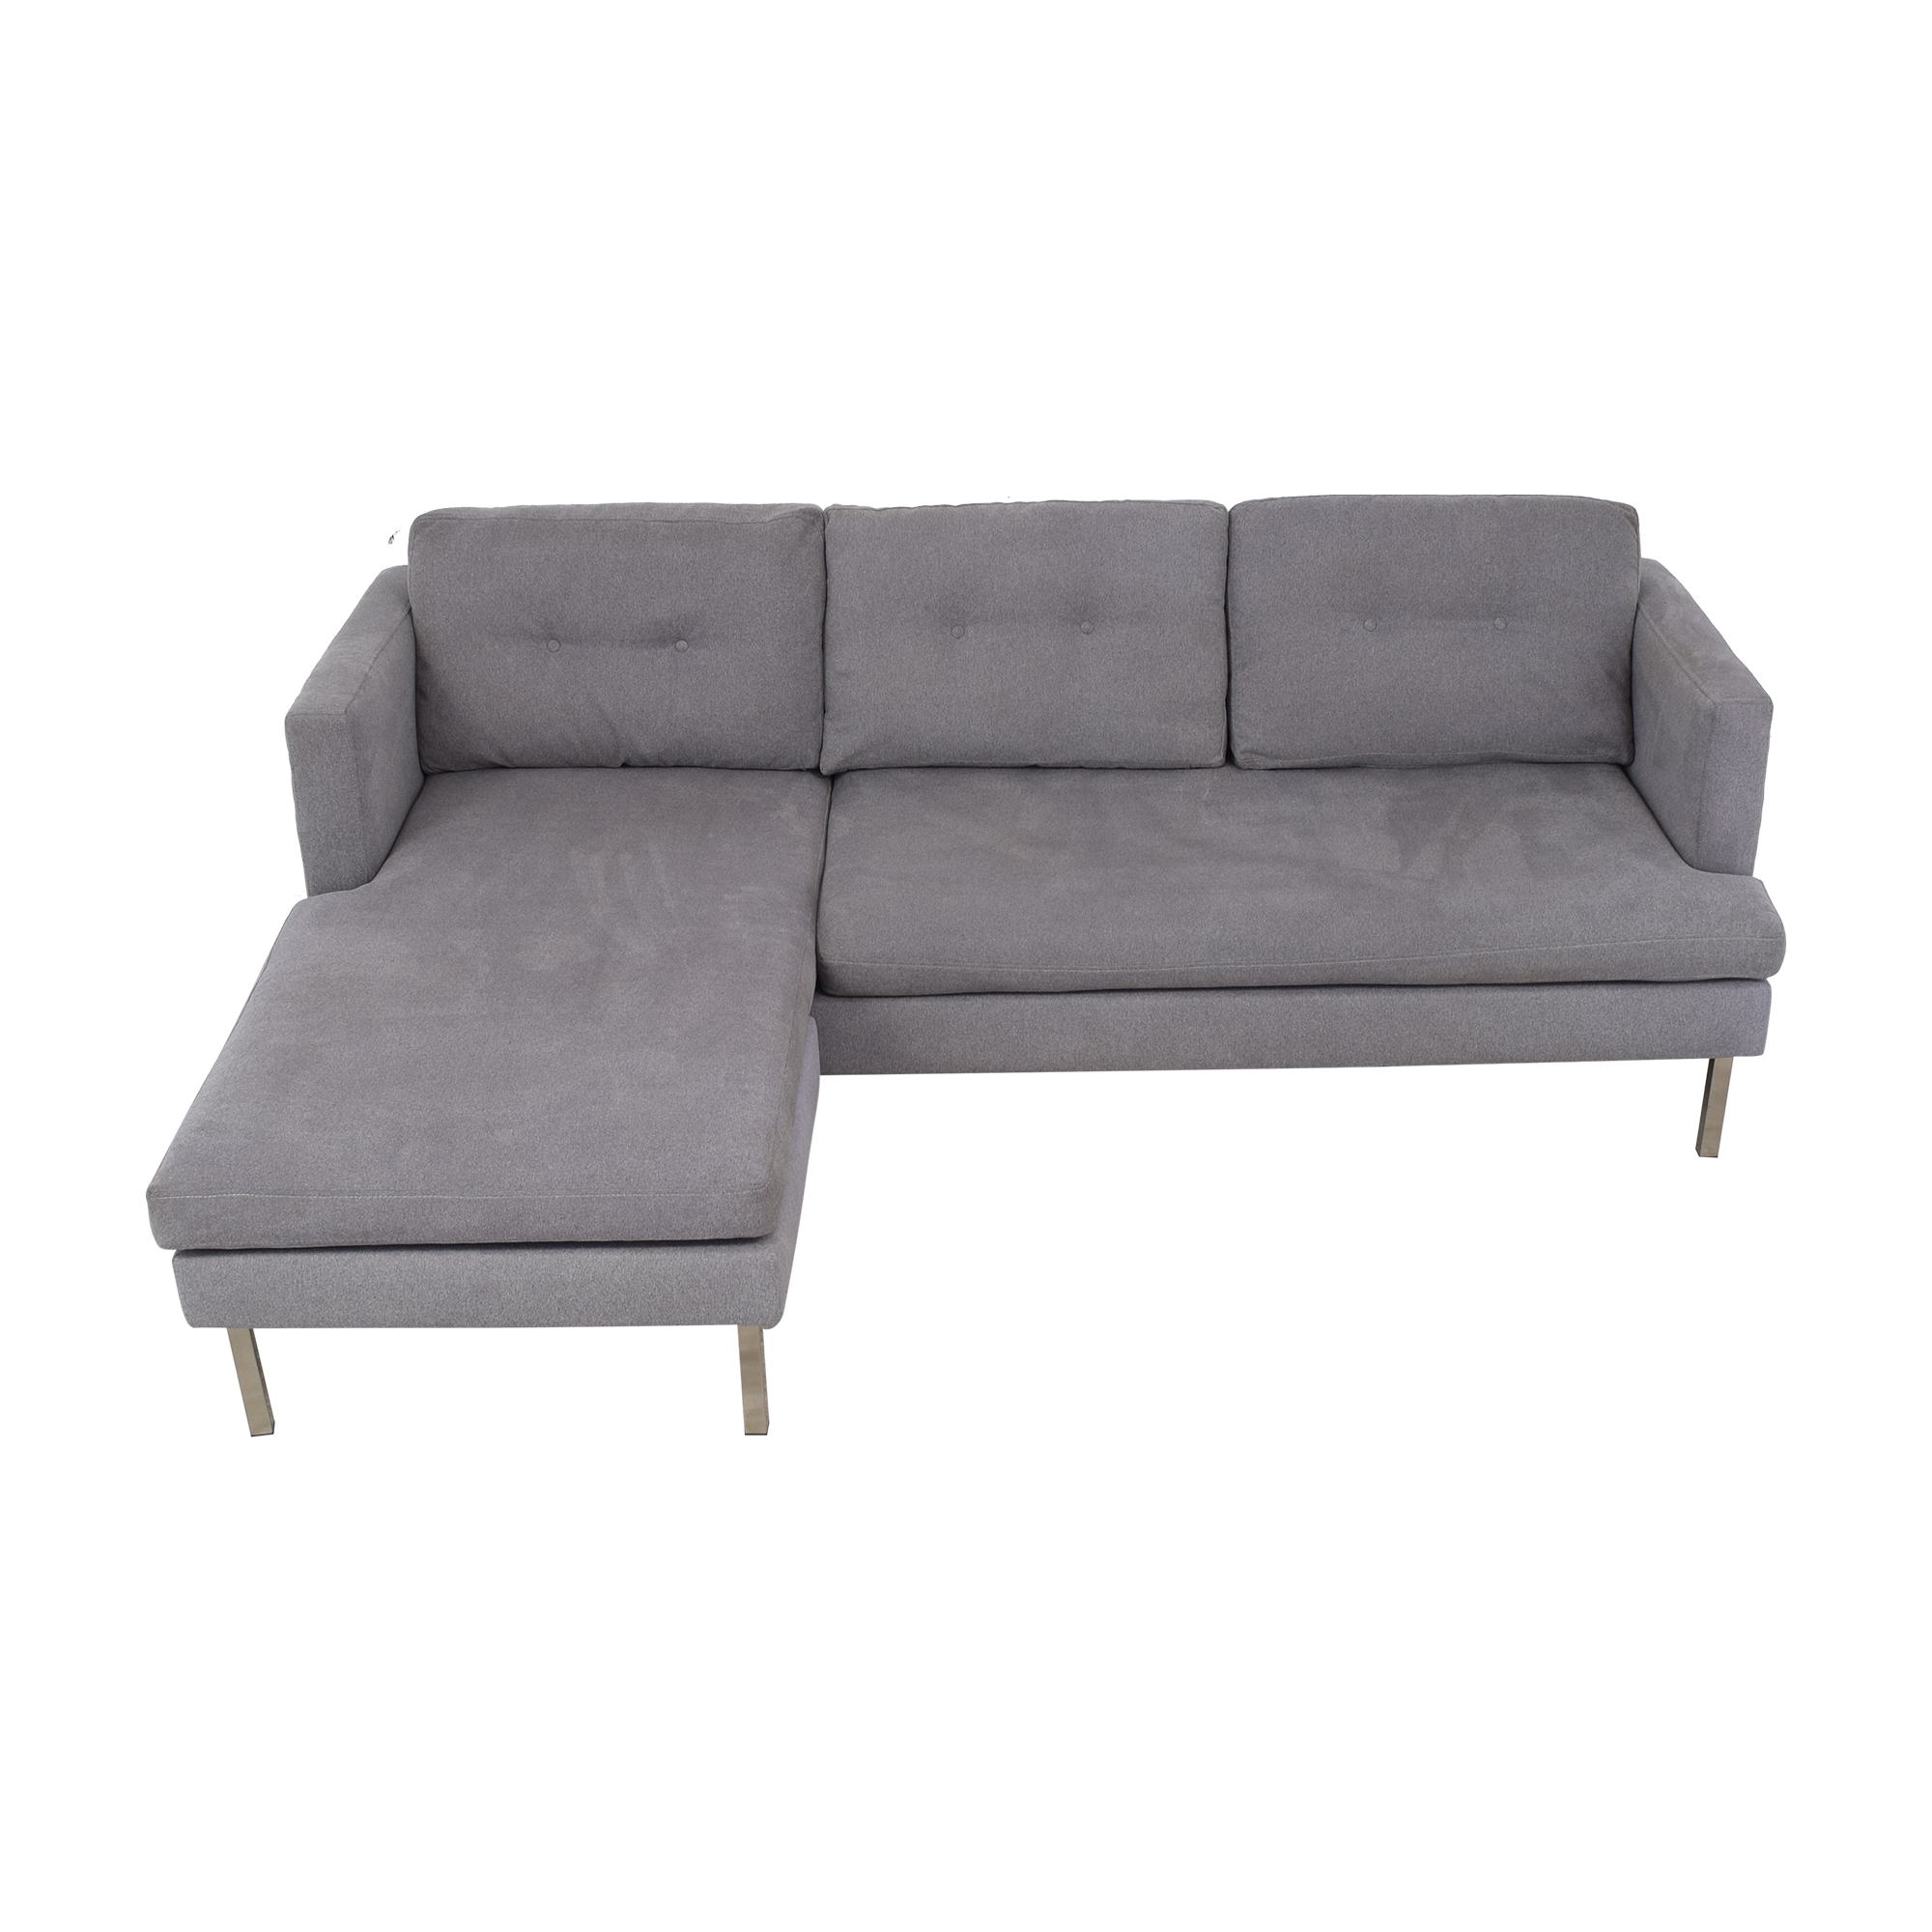 West Elm Jackson Sectional Sofa Sofas